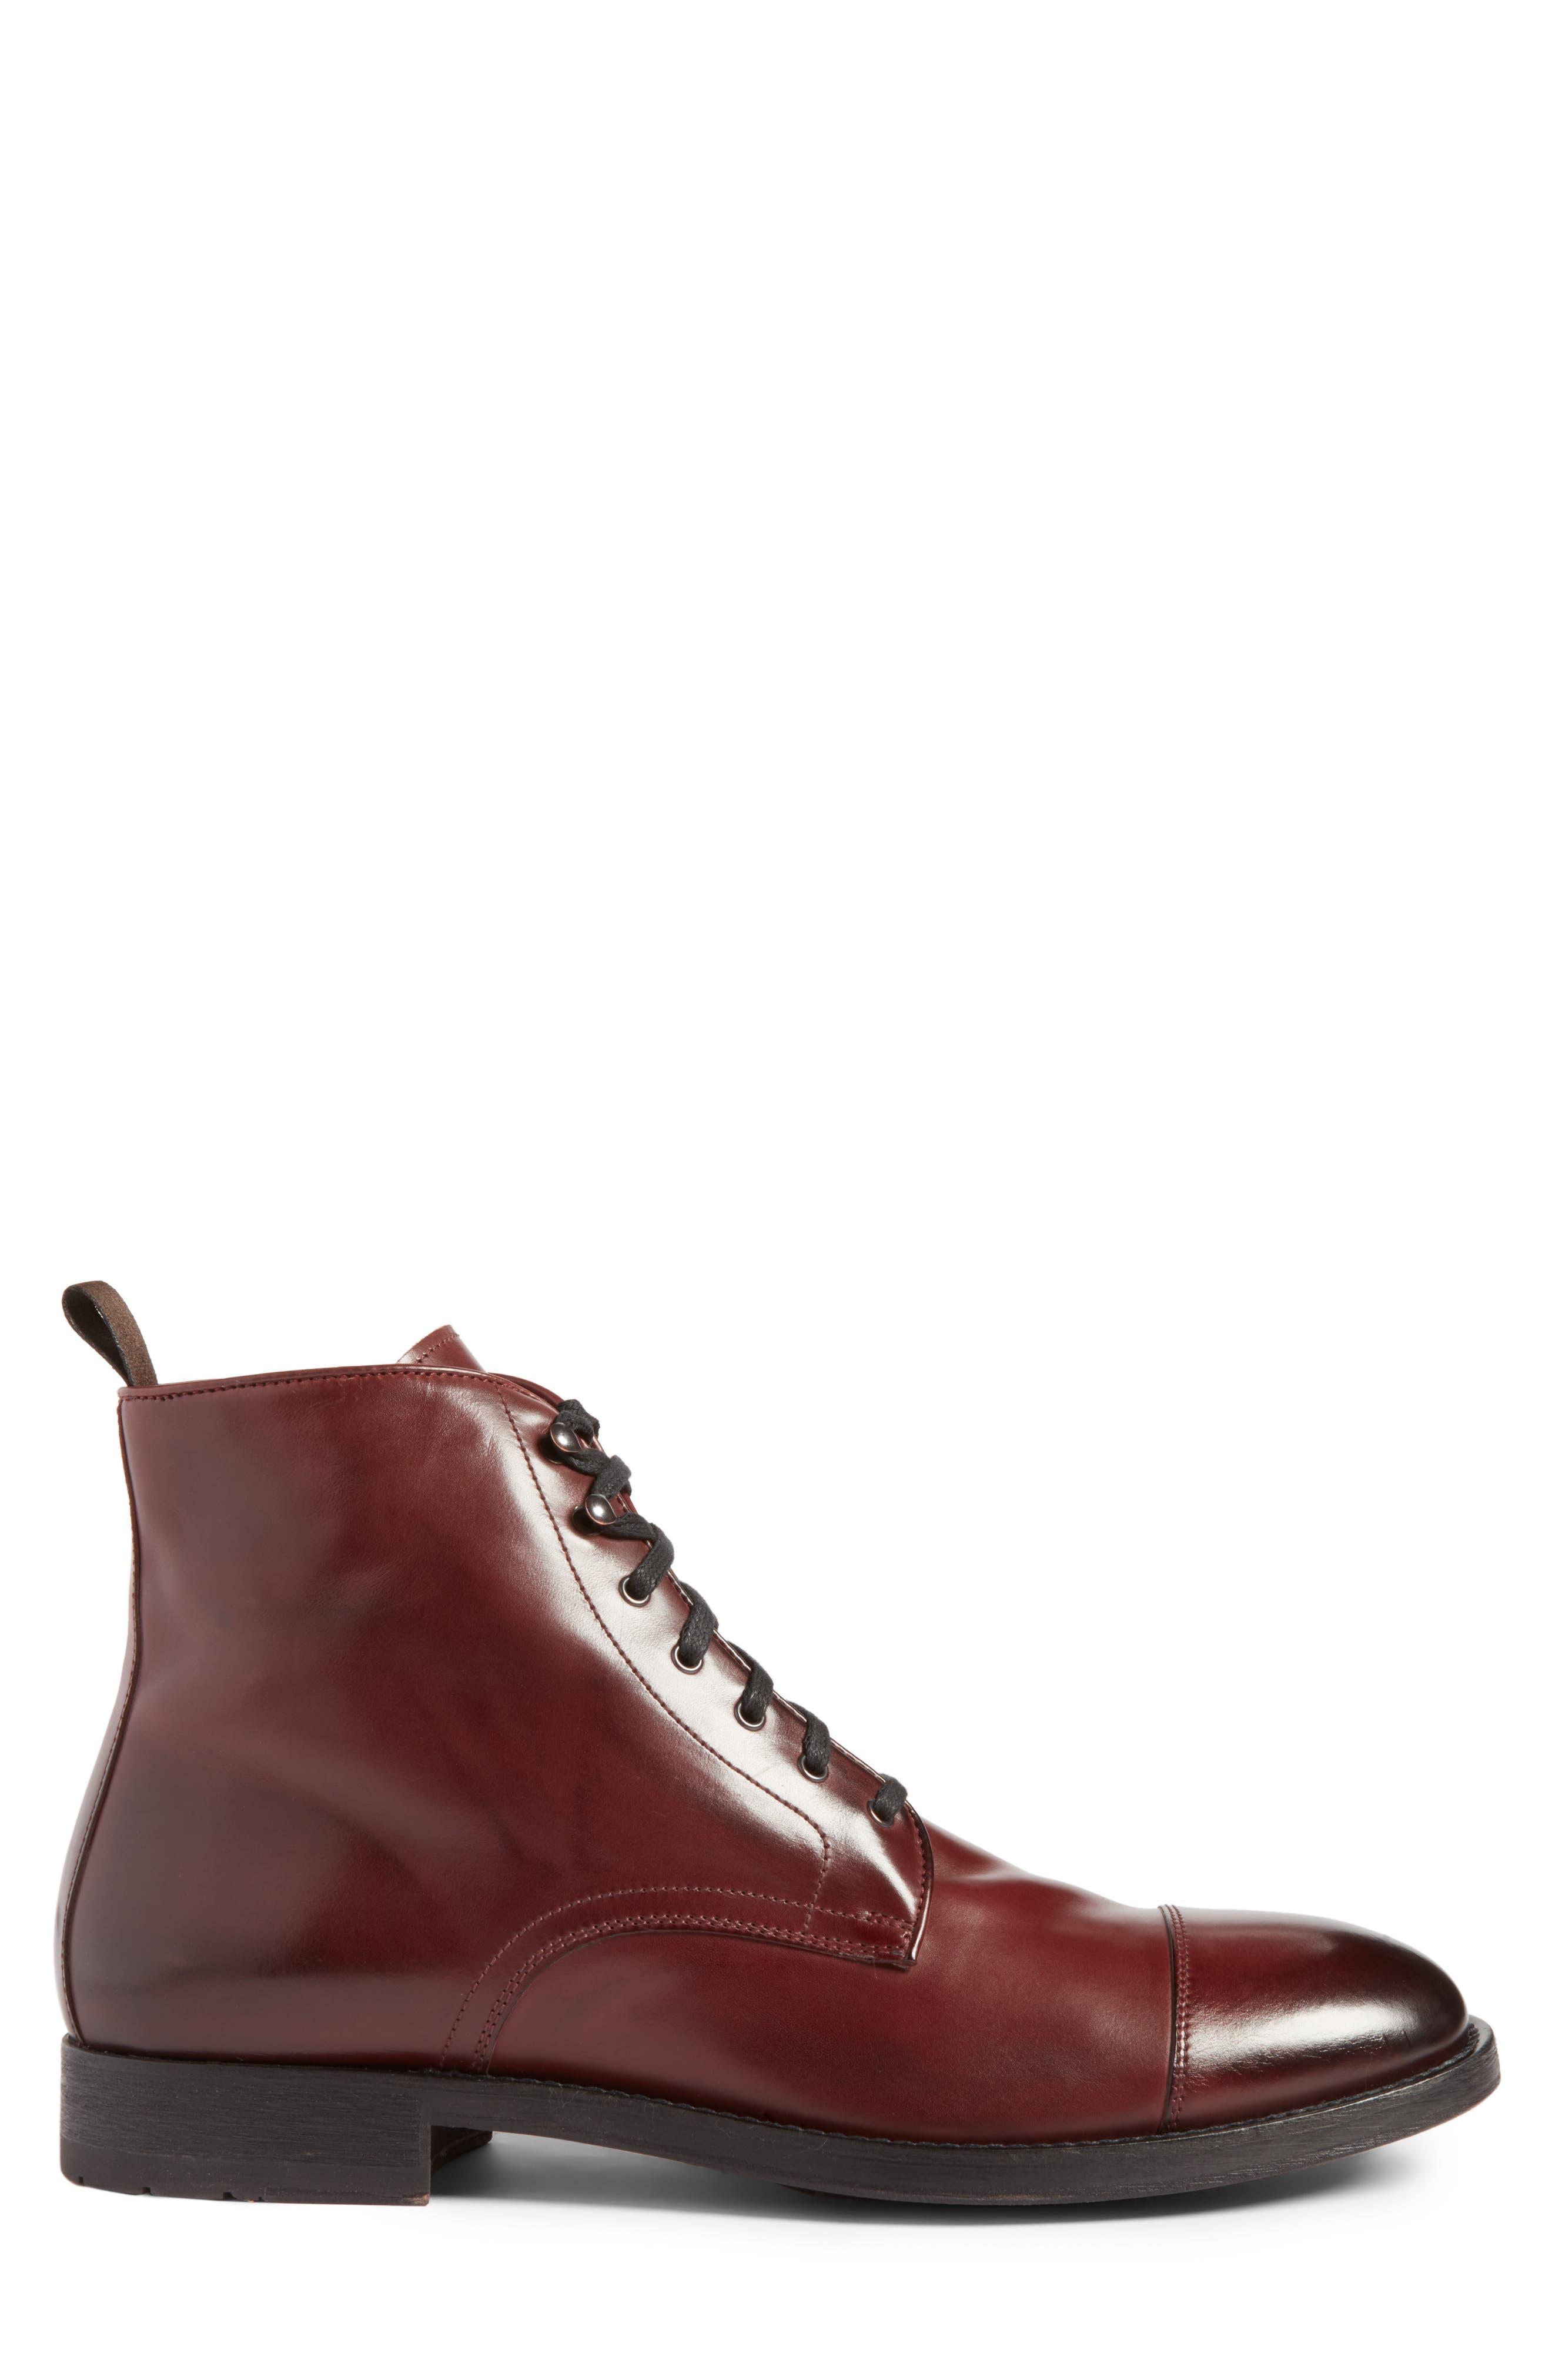 Alternate Image 3  - To Boot New York Bondfield Cap Toe Boot (Men)